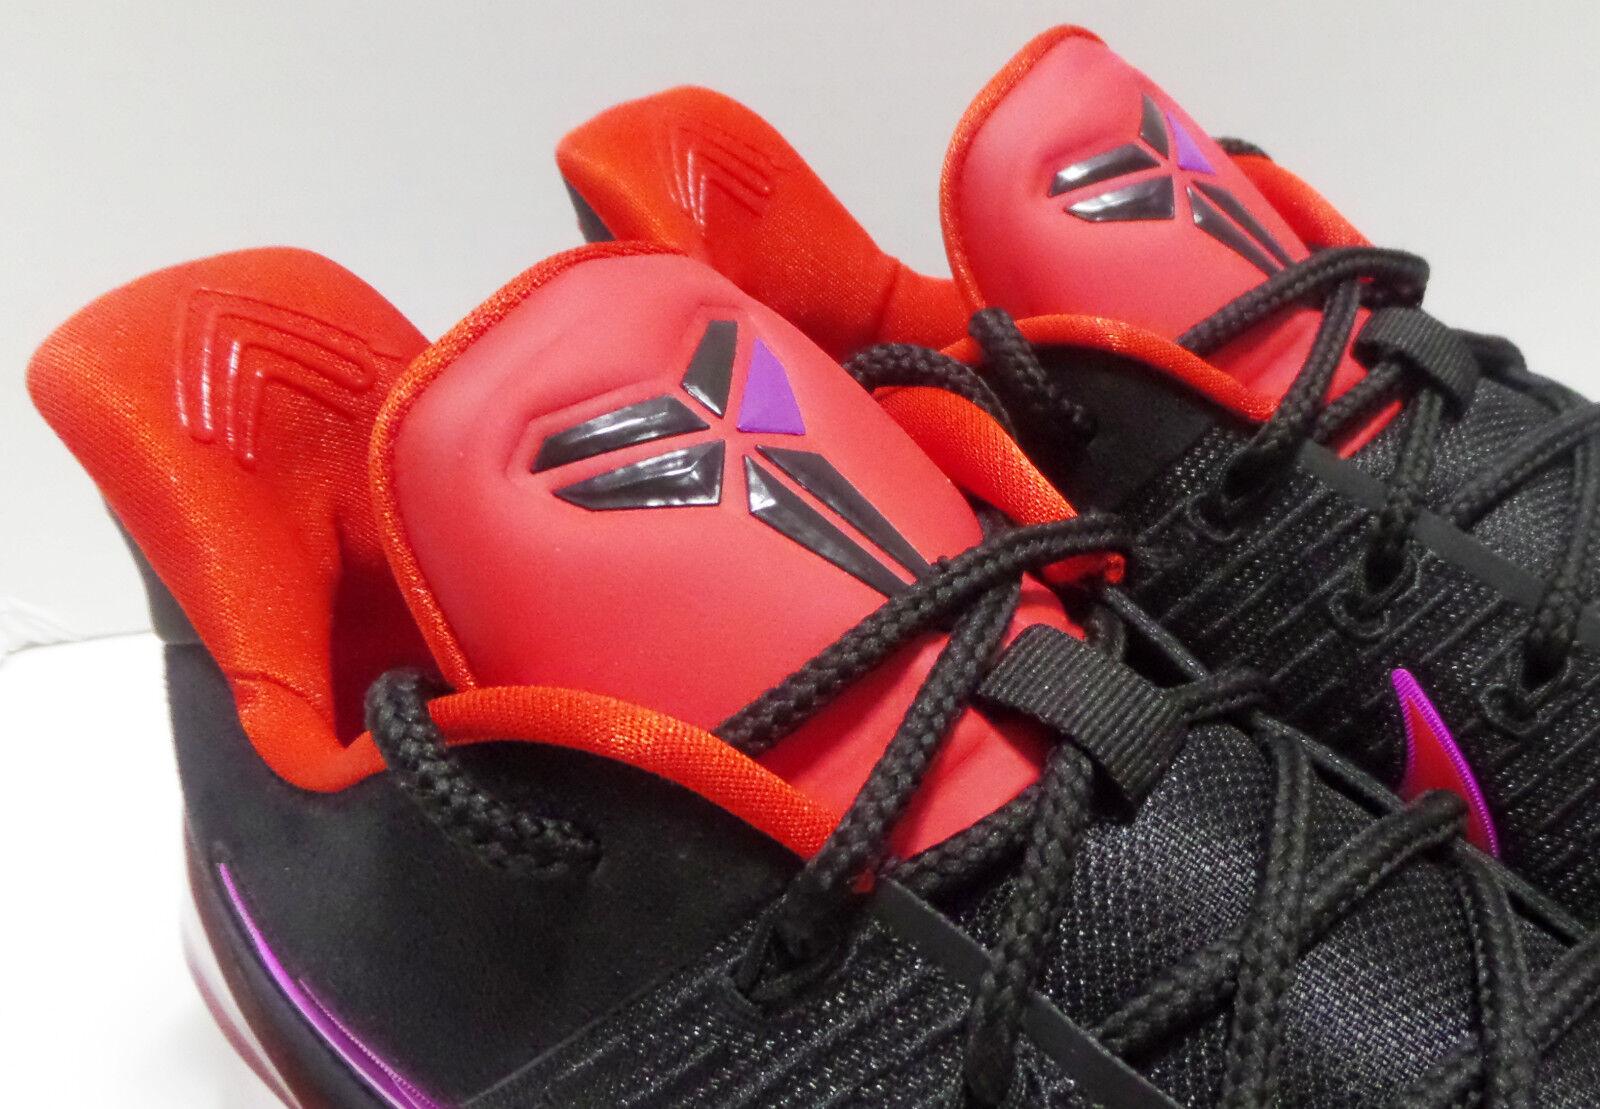 8392f1ff2e1 Mens Nike KOBE KOBE KOBE A.D. Basketball Shoes